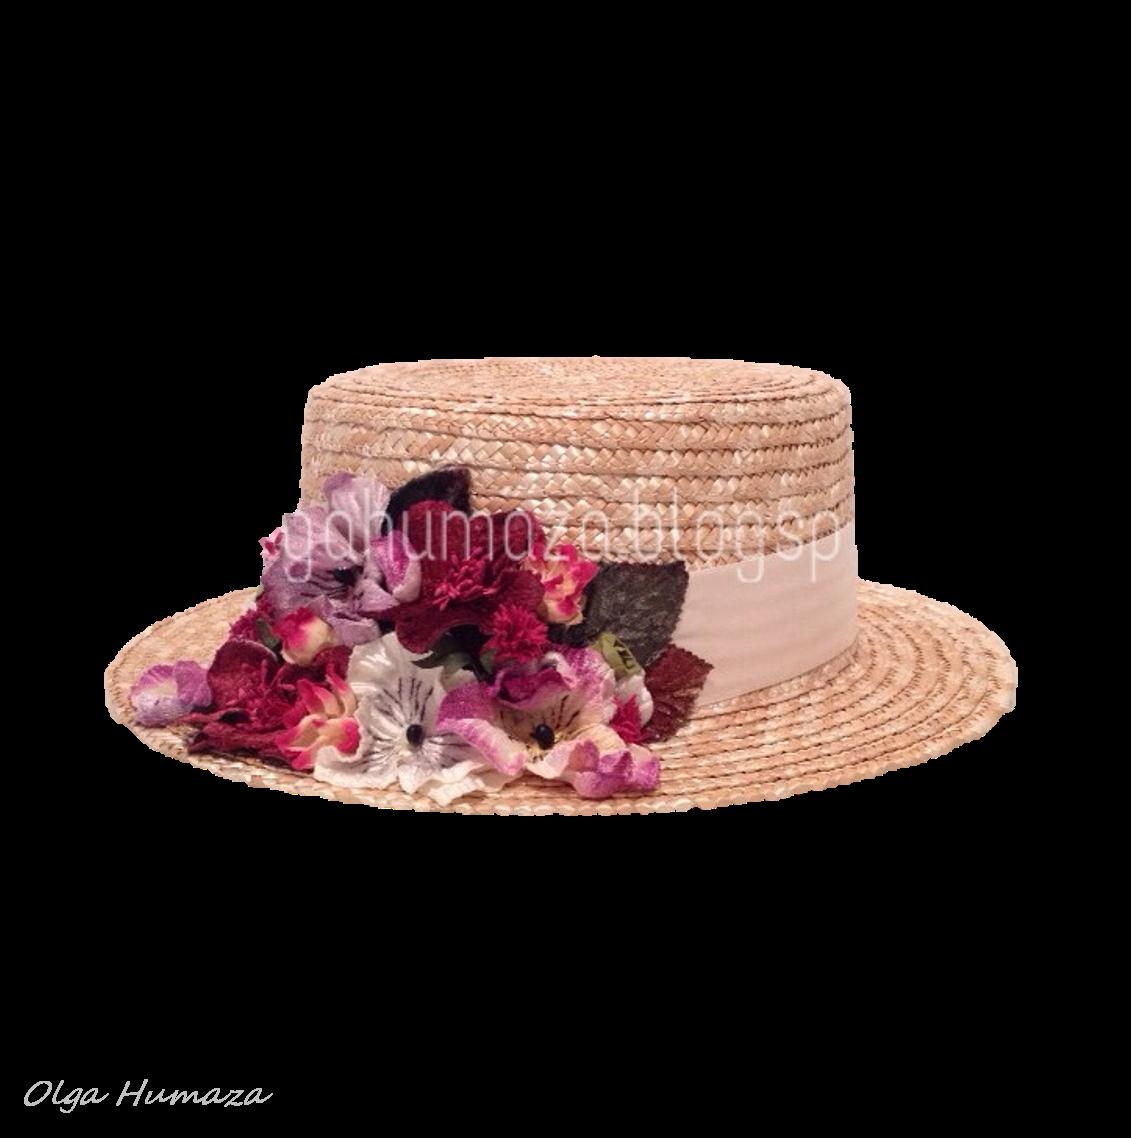 http://olgahumaza.blogspot.com.es/2014/02/b01-sombrero-canotier-natural-y.html